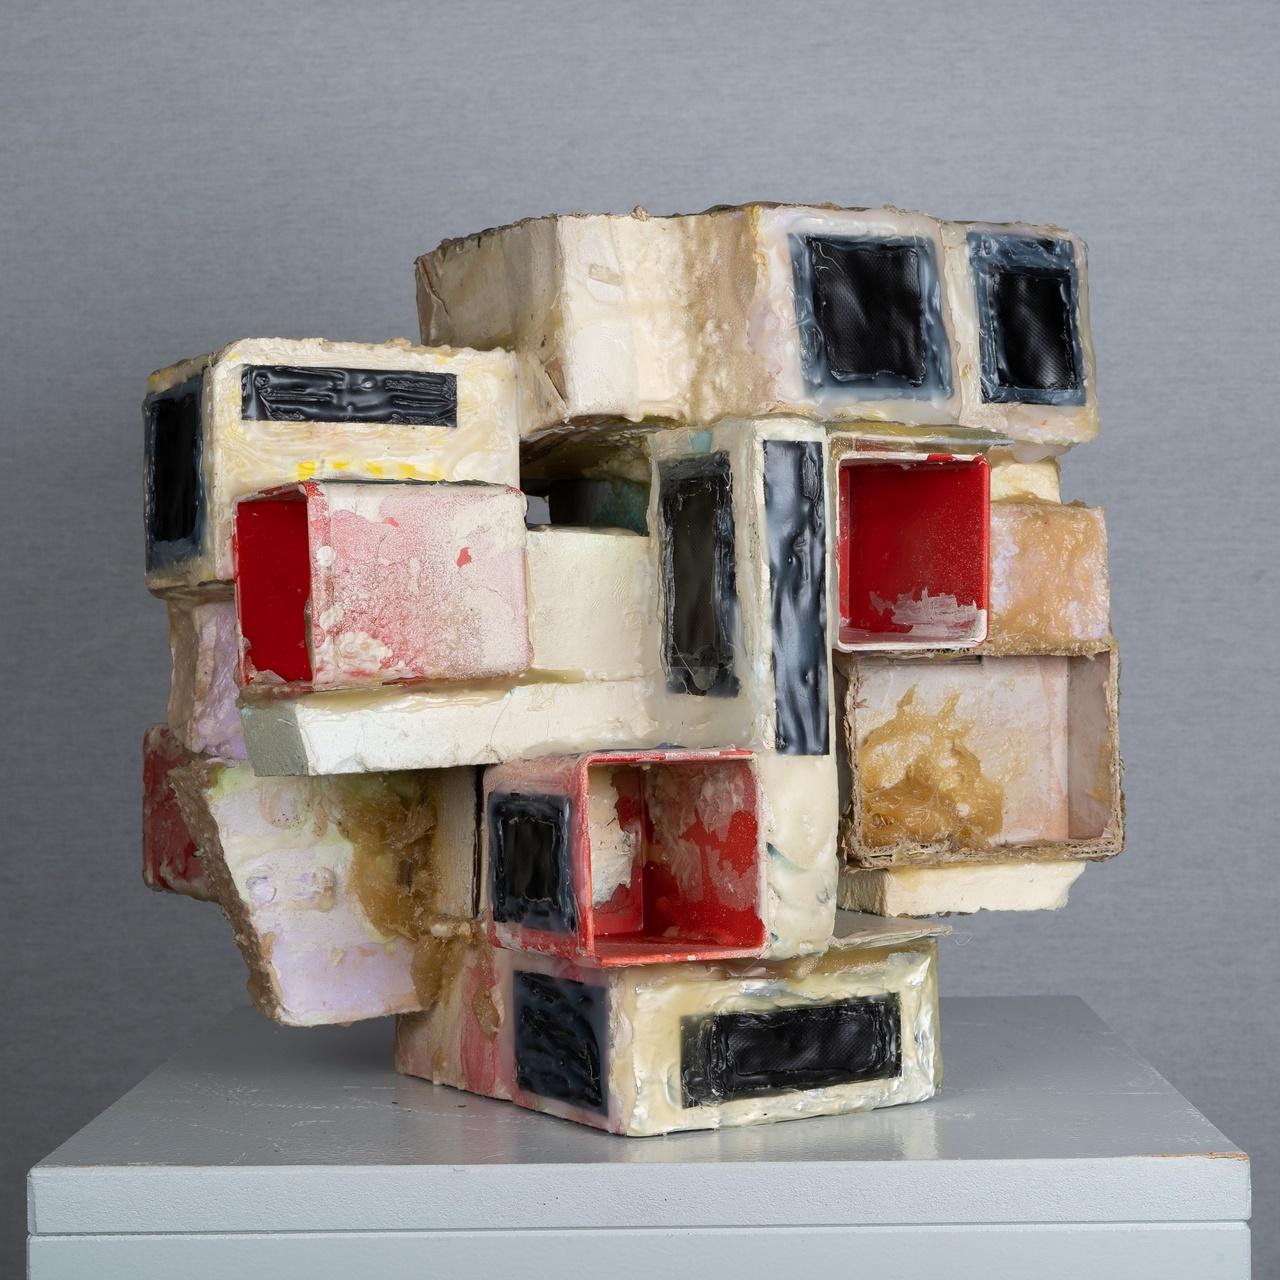 Werk Jimi Kleinbruinink voor tentoonstelling 25 x 25 x 25 (foto RalfSilvius).jpg